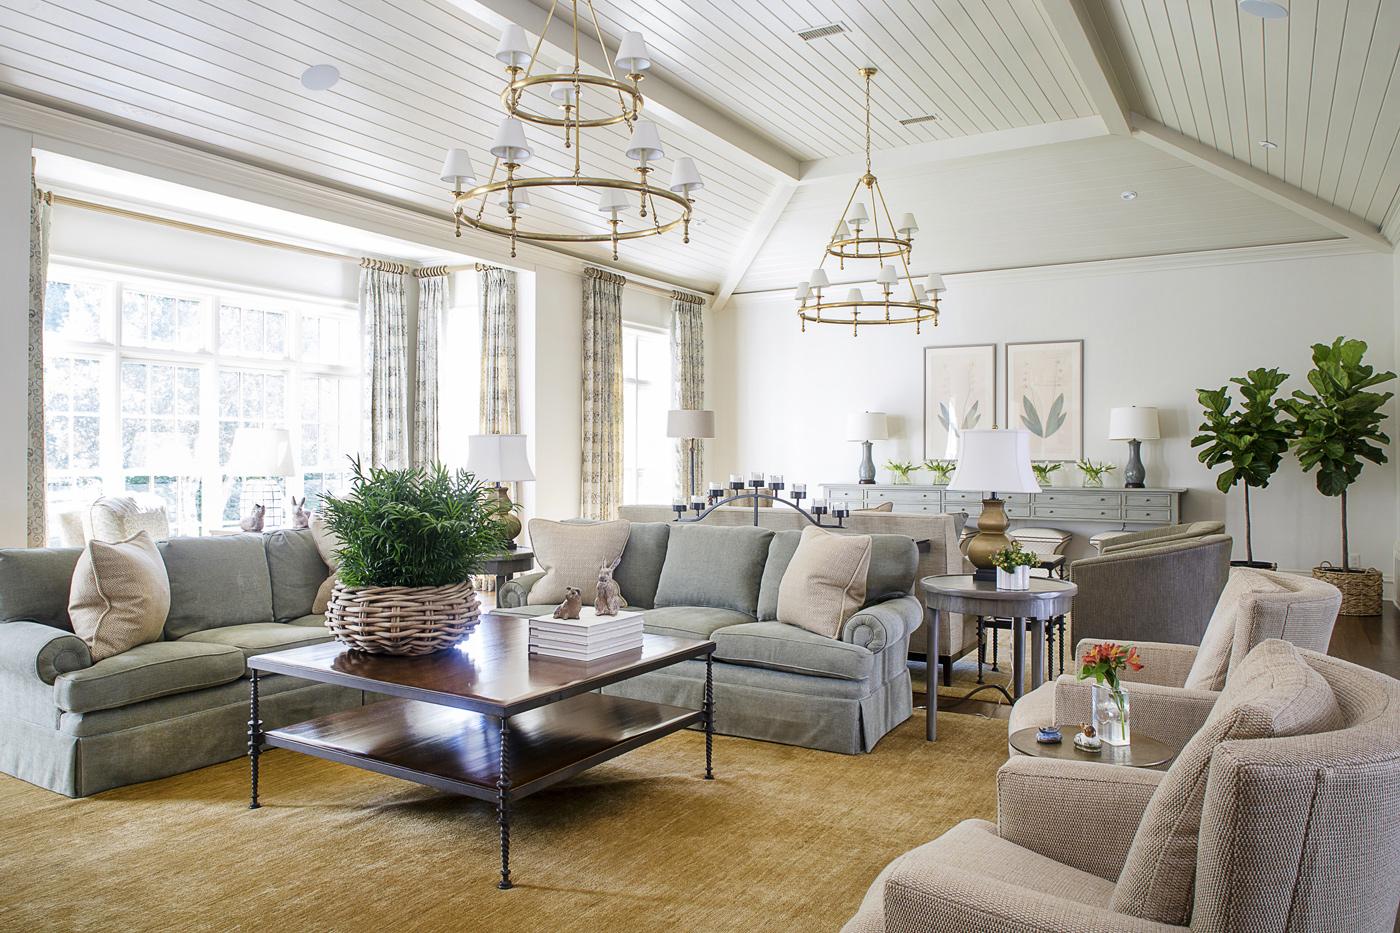 Cindy-McCord-Interior-Design-Collierville-House-009.jpg